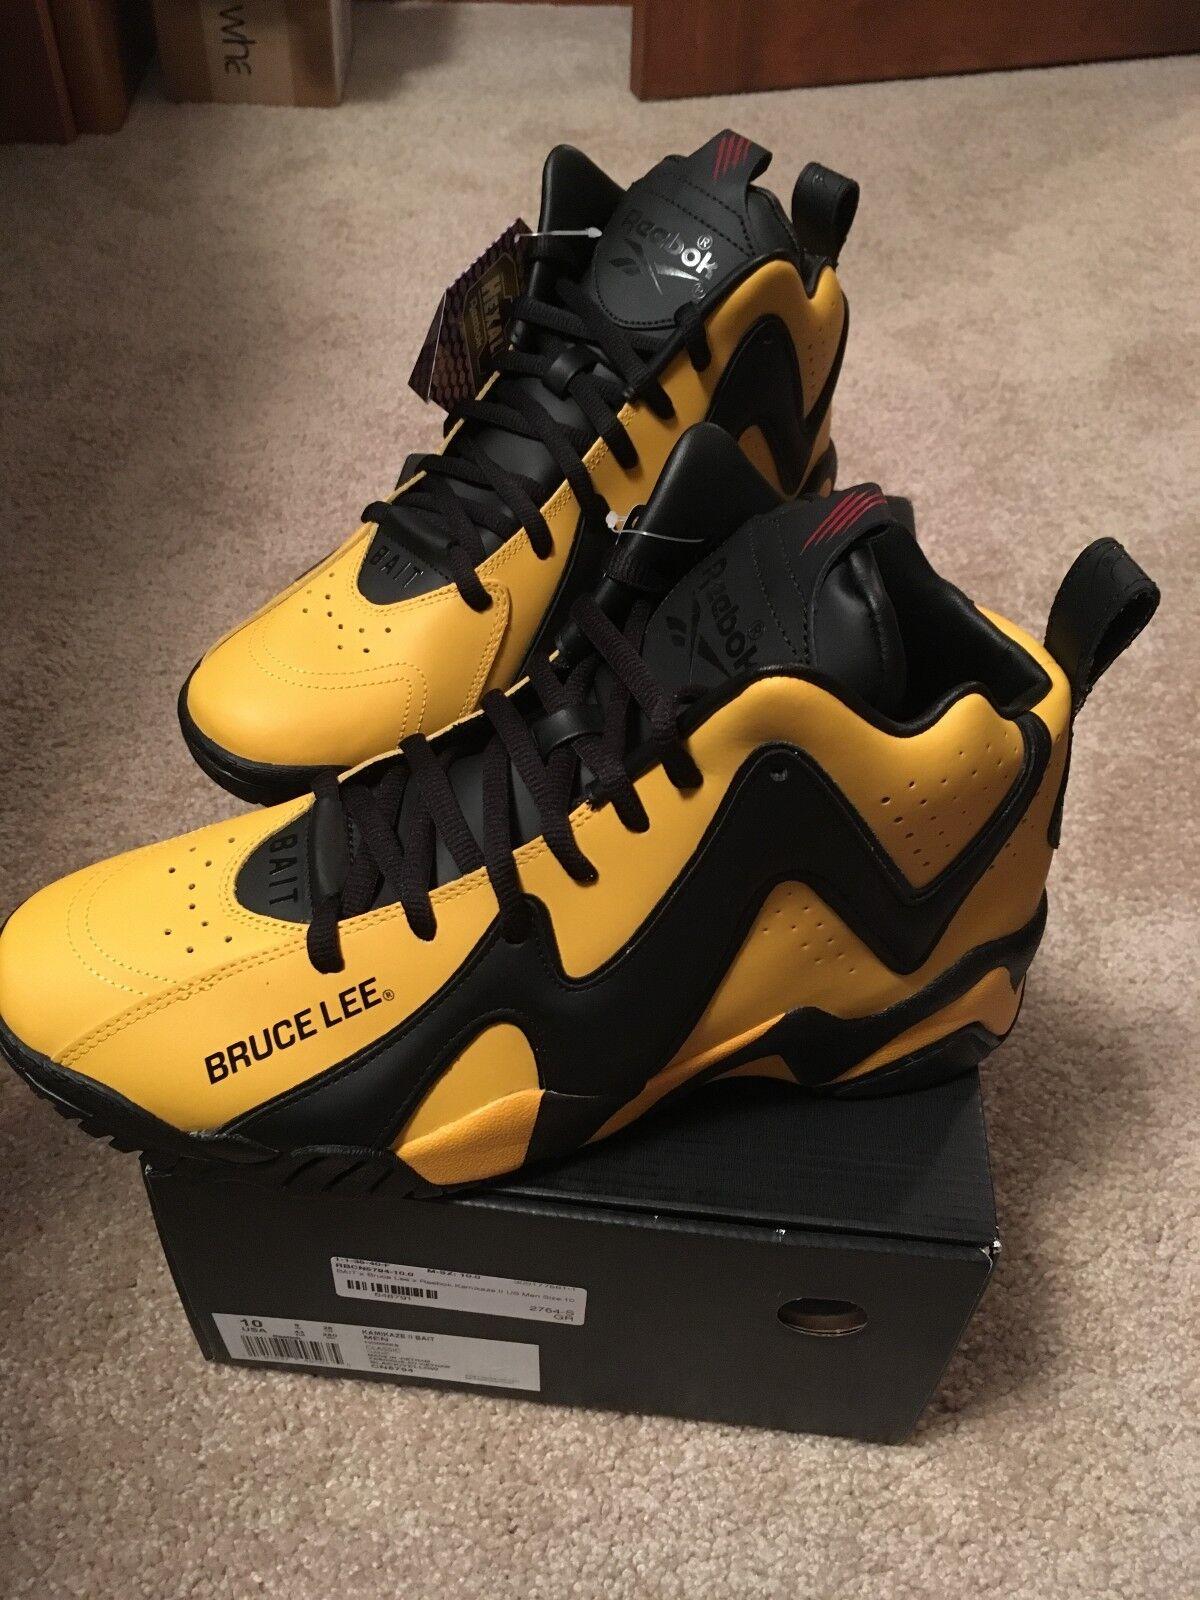 Mens Size 10 Reebok x Bait x Bruce Lee Kamikaze 2 Black Yellow CN5794 NEW DS